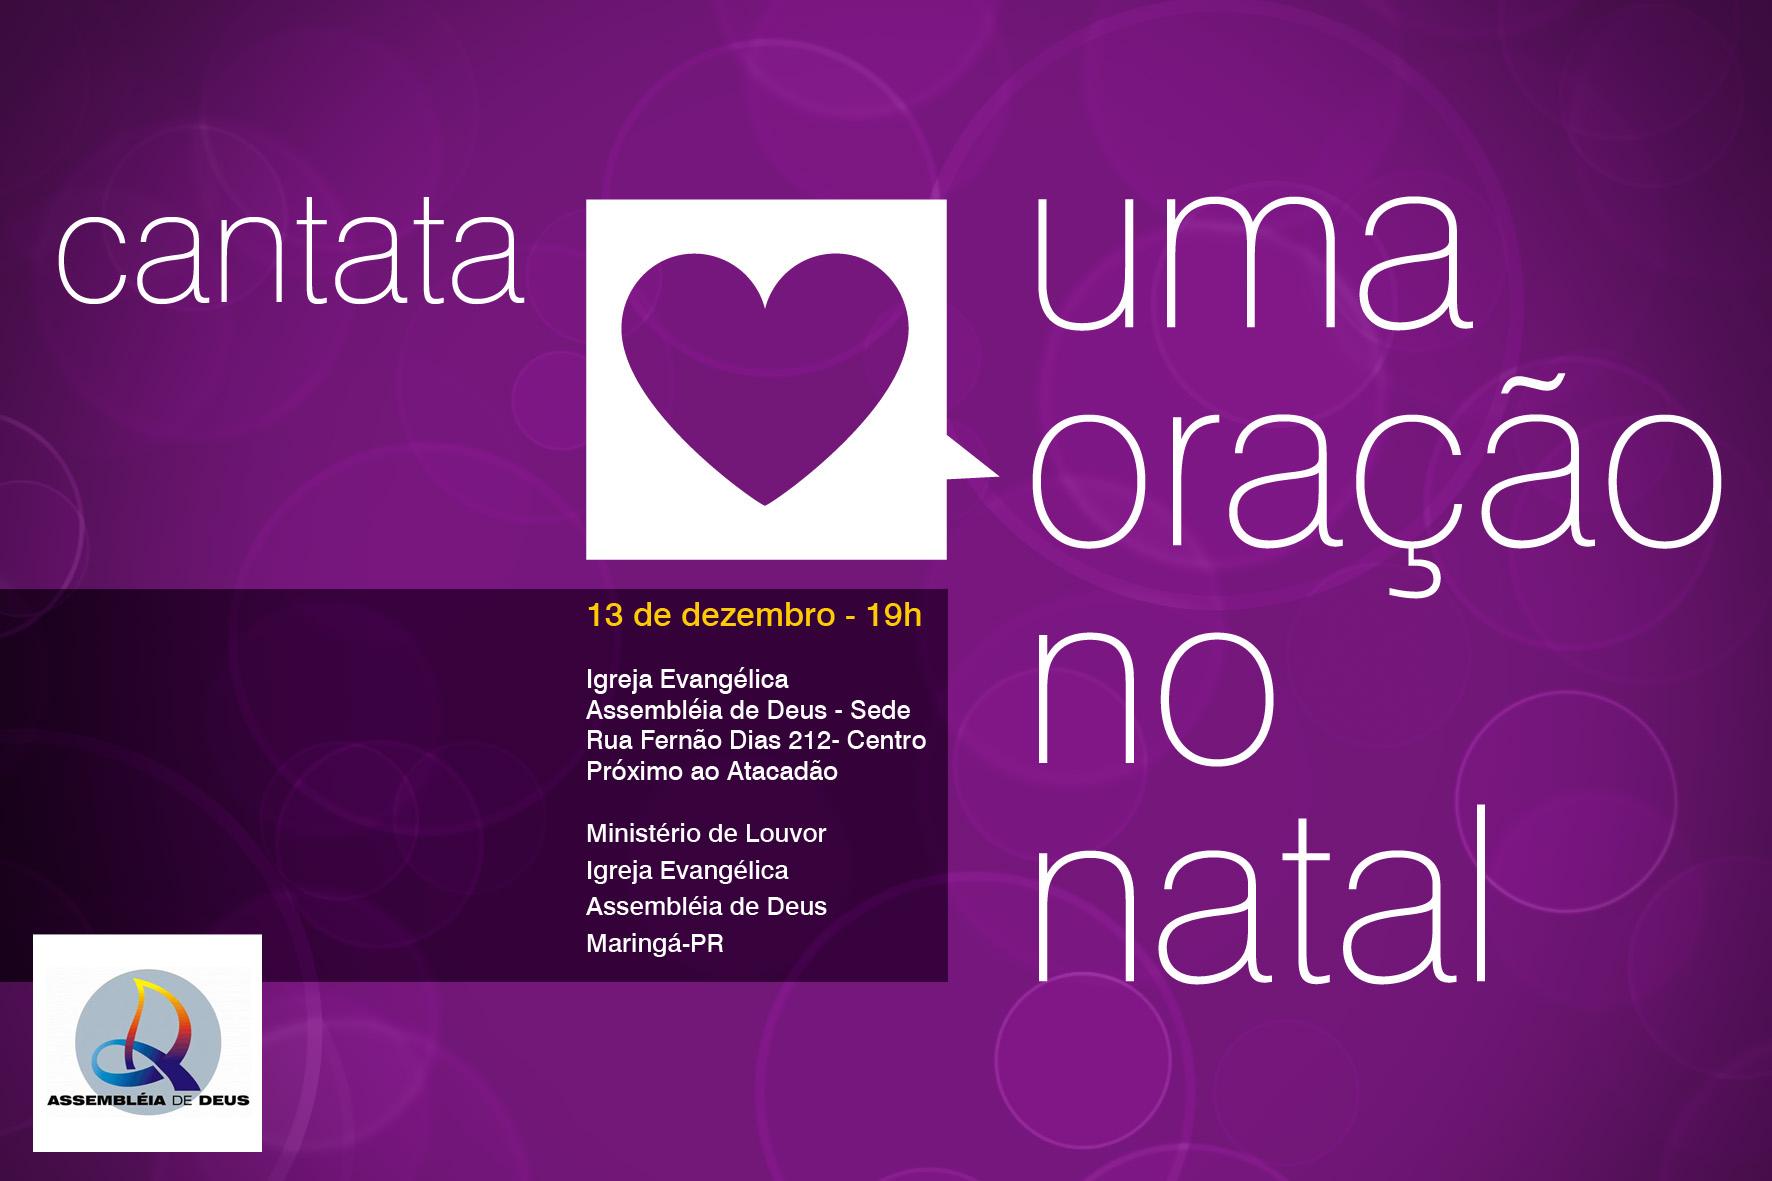 http://www.turmadableia.com.br/Cartaz2.jpg